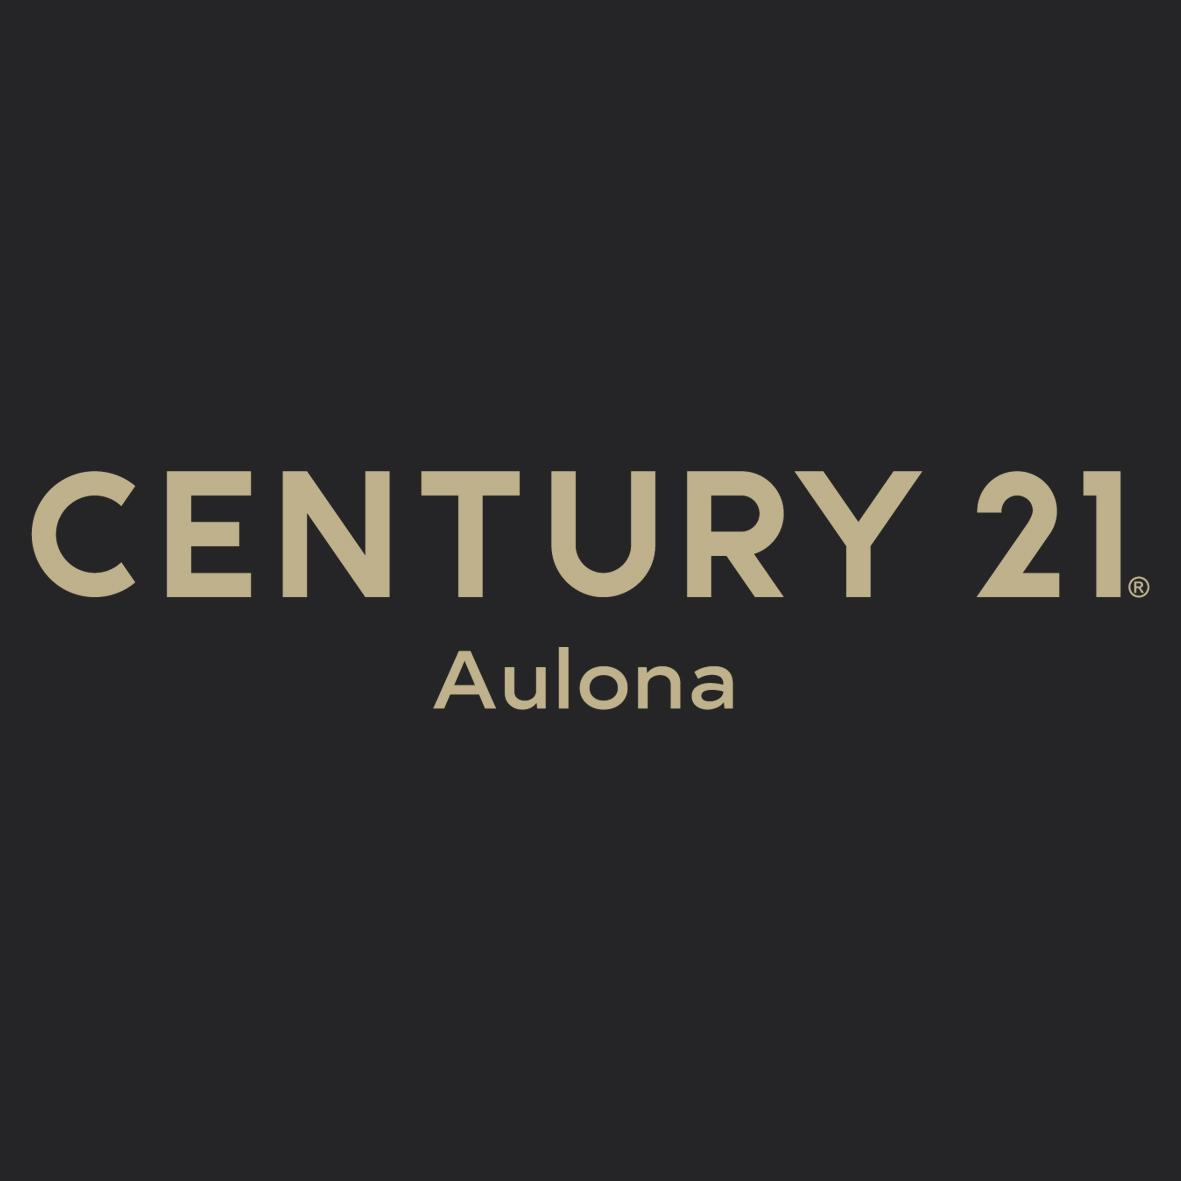 CENTURY 21 Aulona